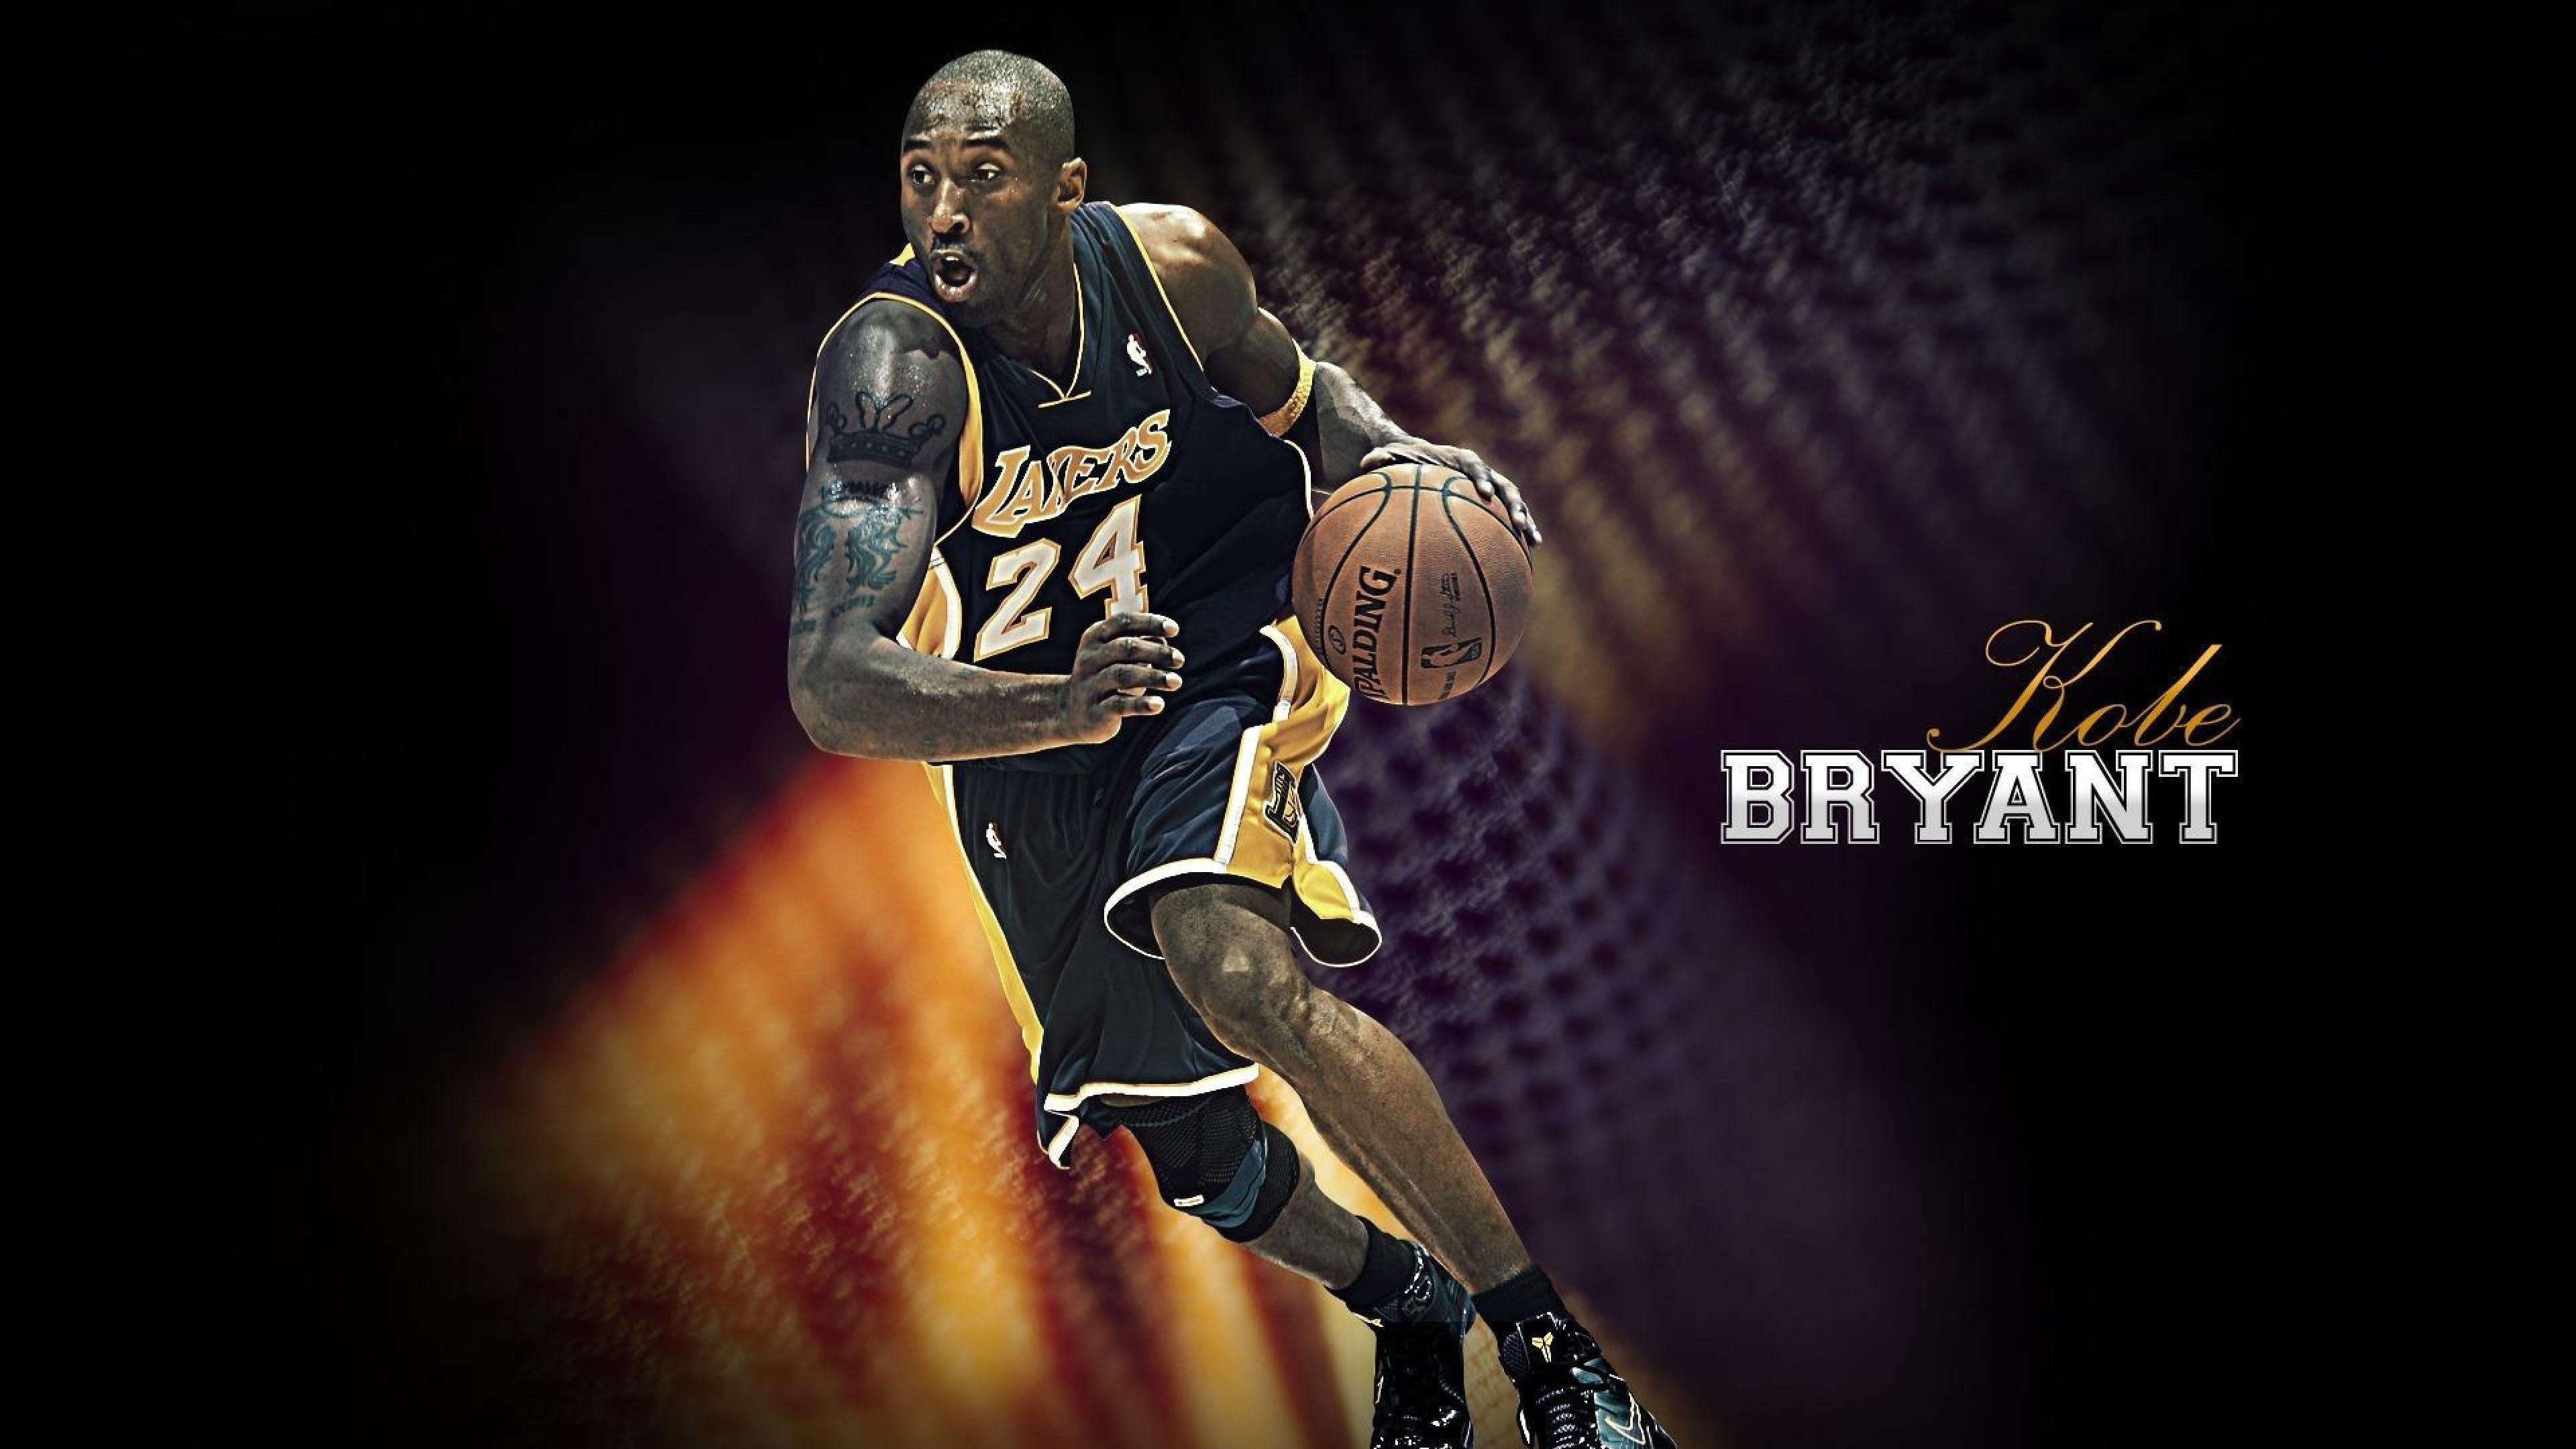 Kobe Bryant 4k Wallpapers Top Free Kobe Bryant 4k Backgrounds Wallpaperaccess